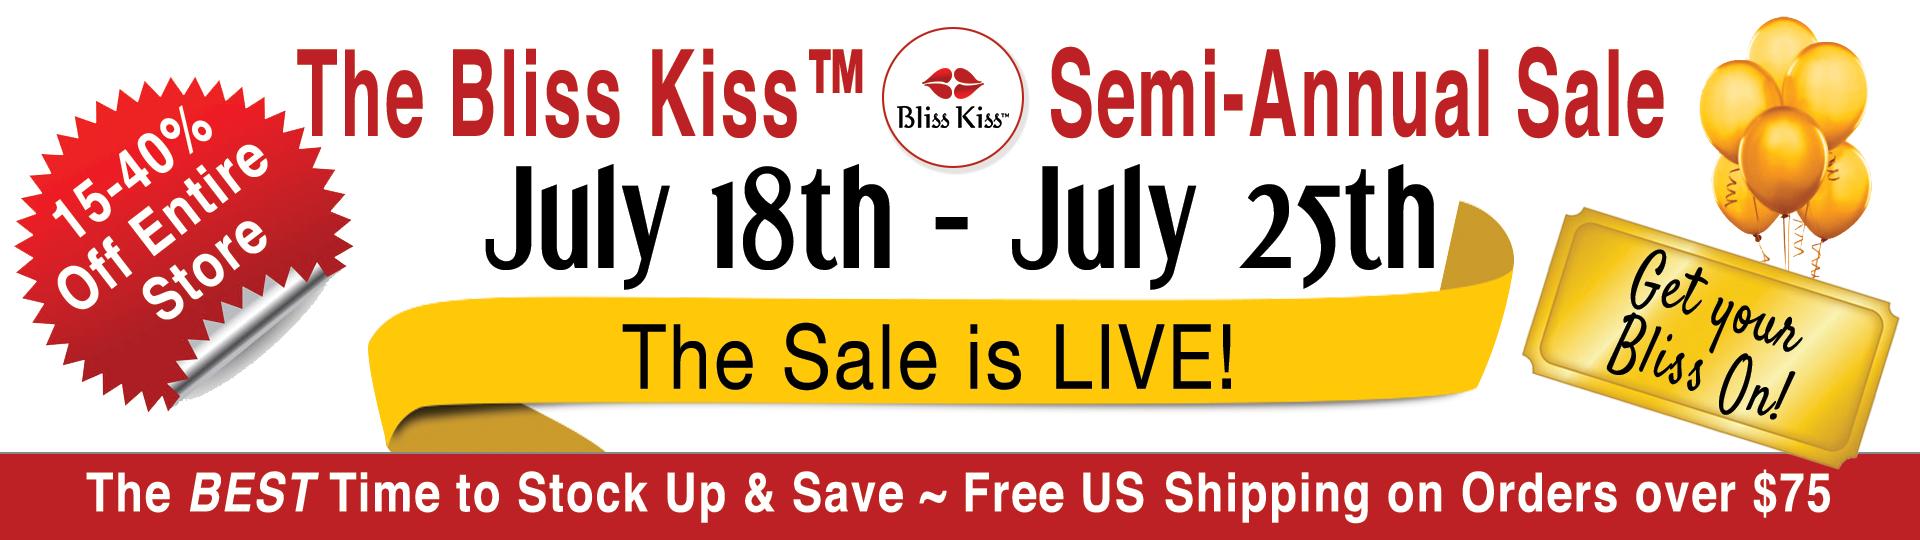 july-17-sales-banner-sale-is-live.png